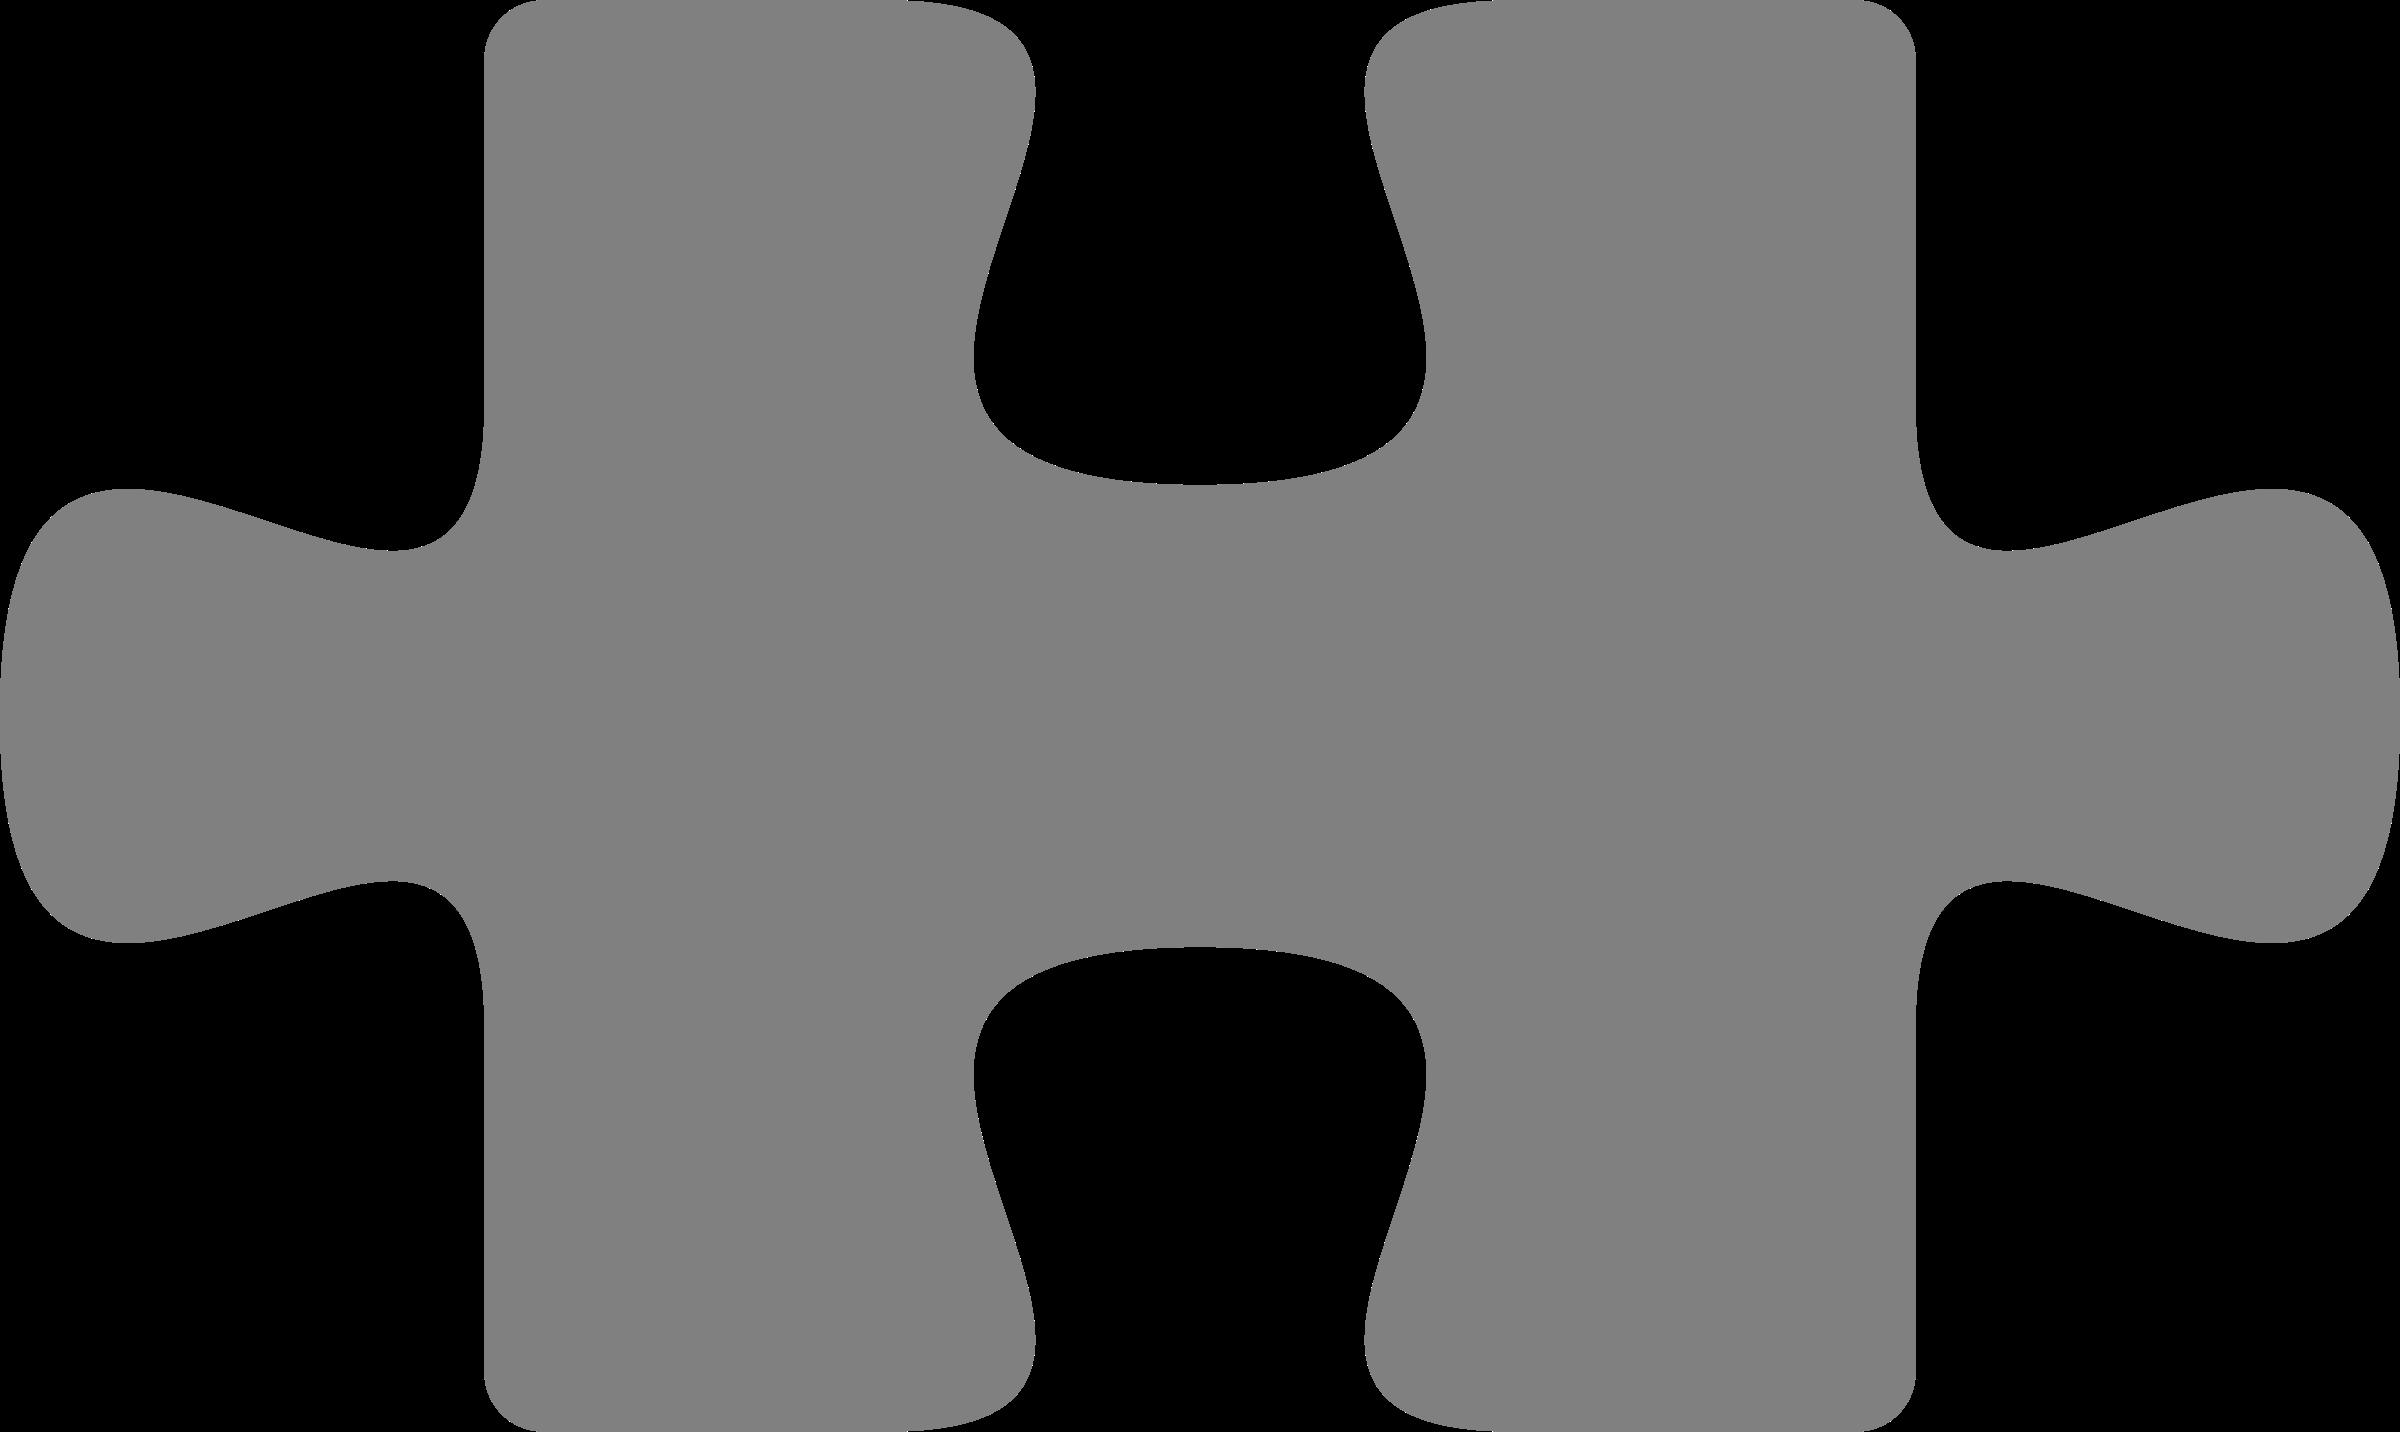 Image Result For Grey Puzzle Piece Puzzle Pieces Blank Puzzle Pieces Puzzle